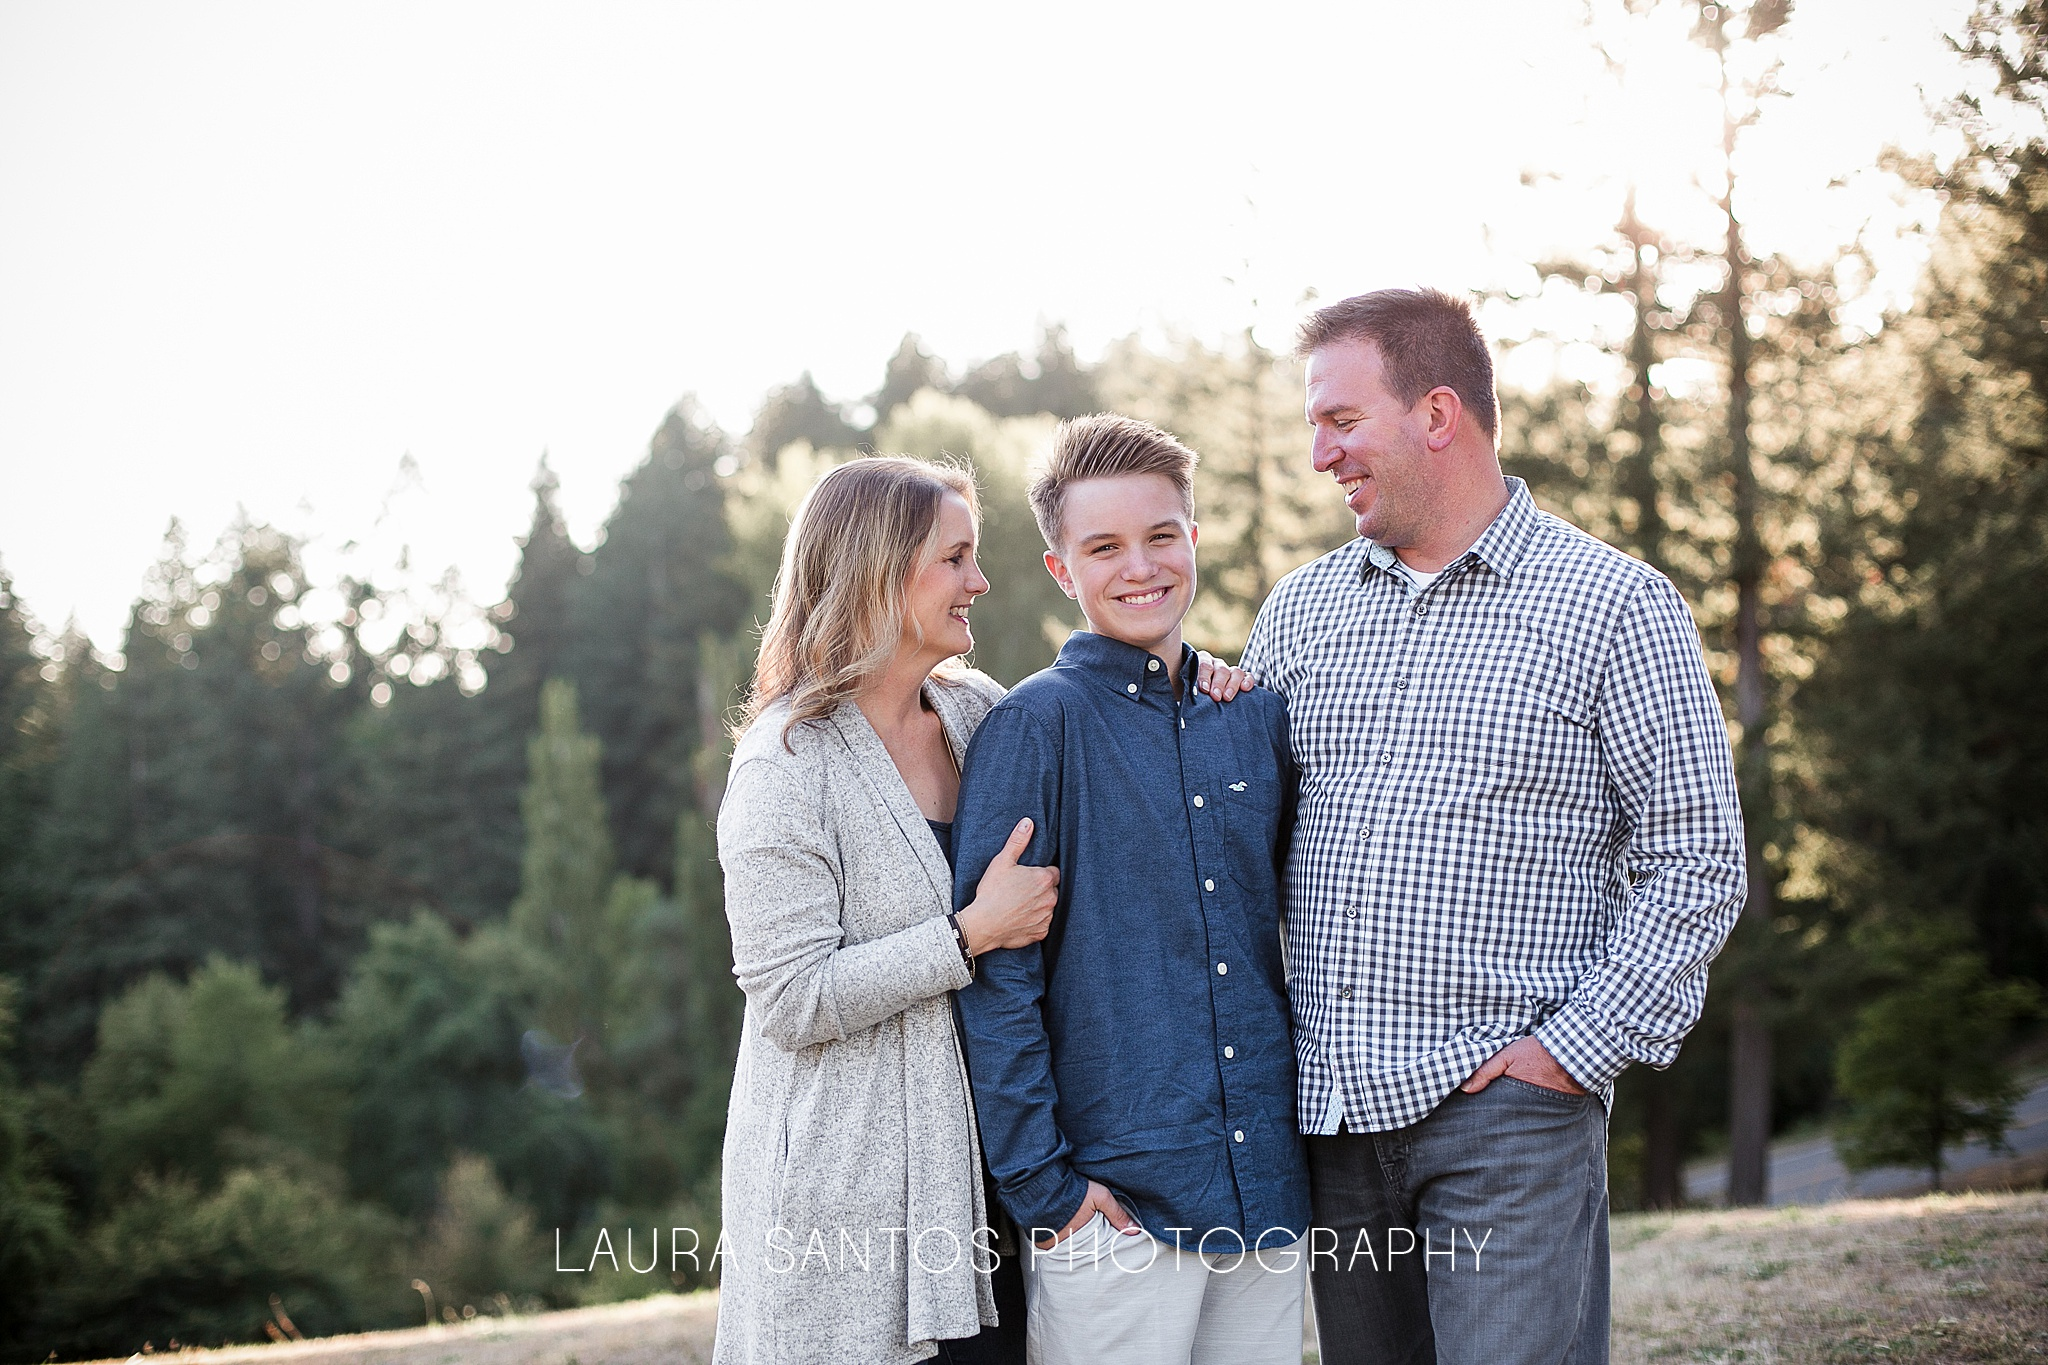 Laura Santos Photography Portland Oregon Family Photographer_0790.jpg